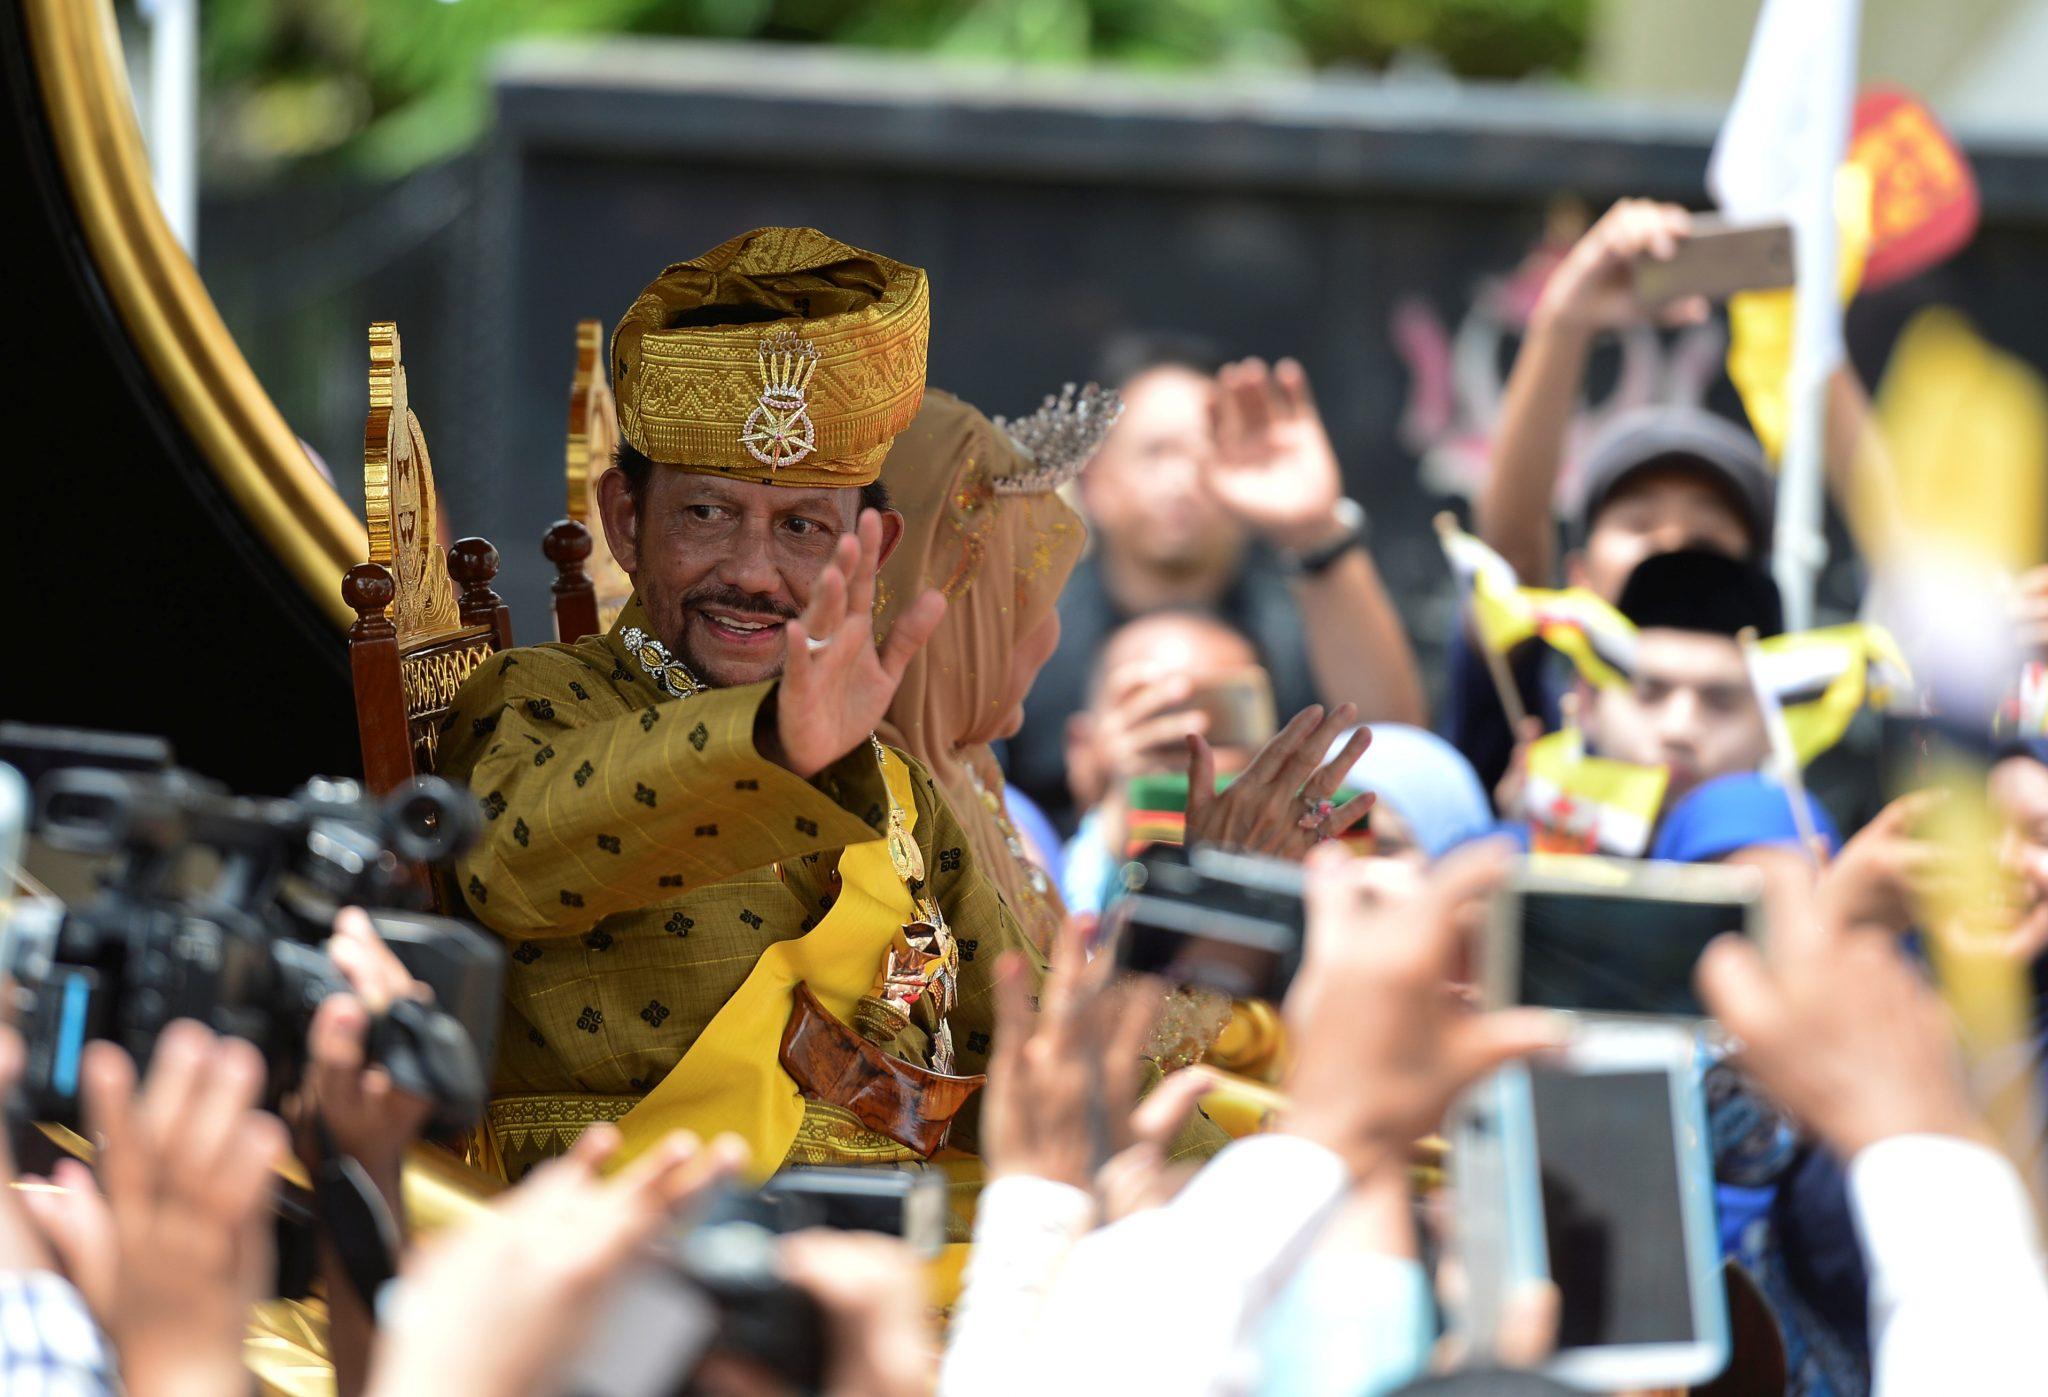 The state of Islam in Brunei